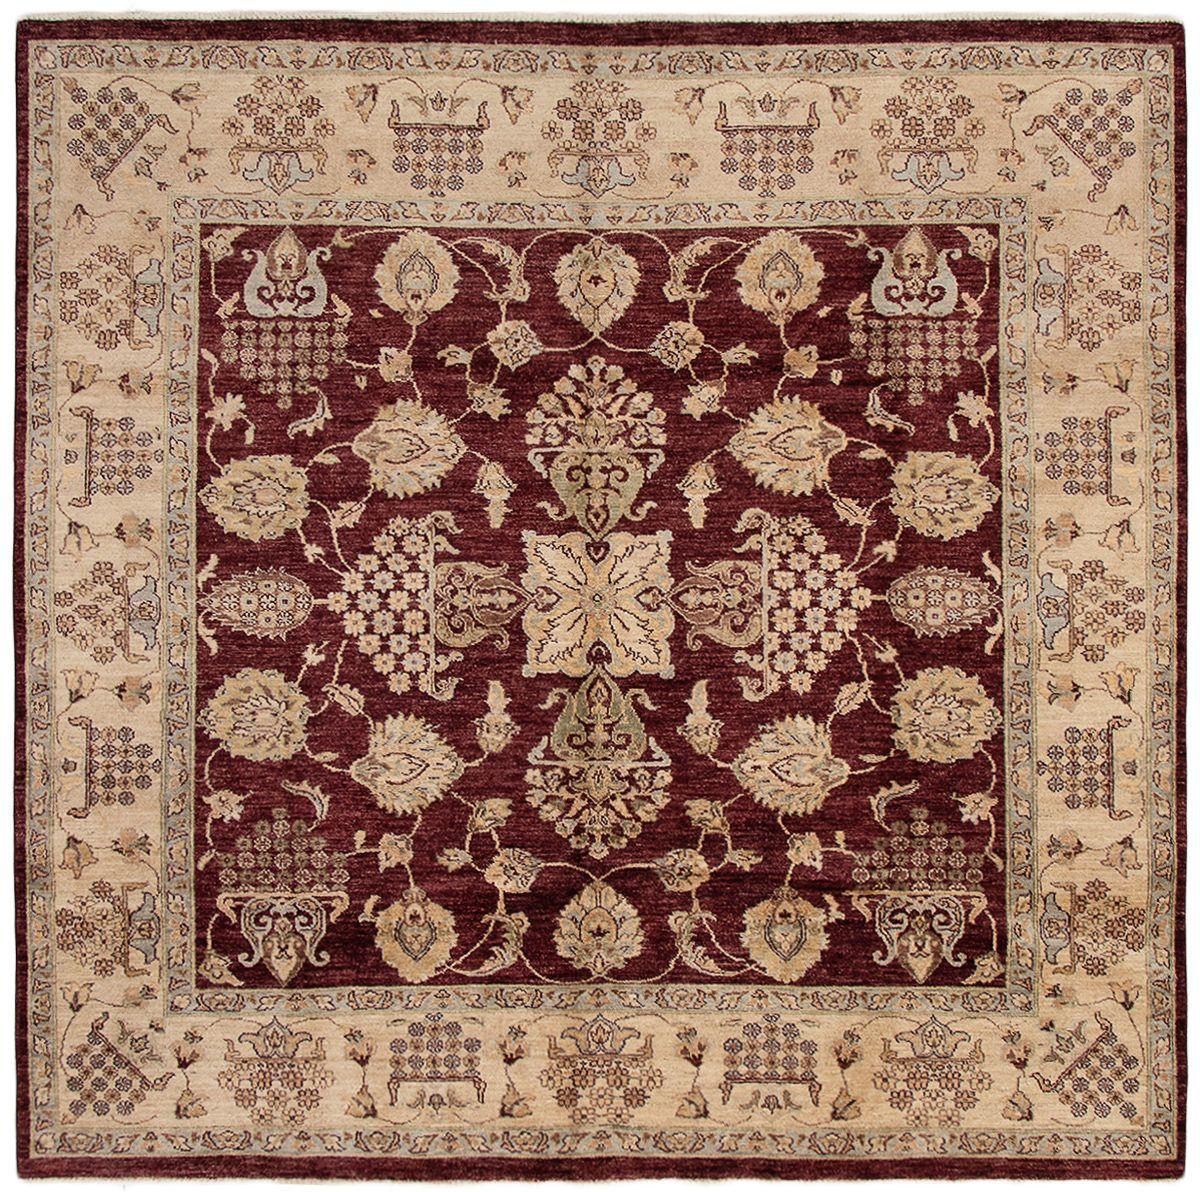 "Hand-knotted Chobi Twisted Burgundy Wool Rug 8'1"" x 7'10"" Size: 8'1"" x 7'10"""